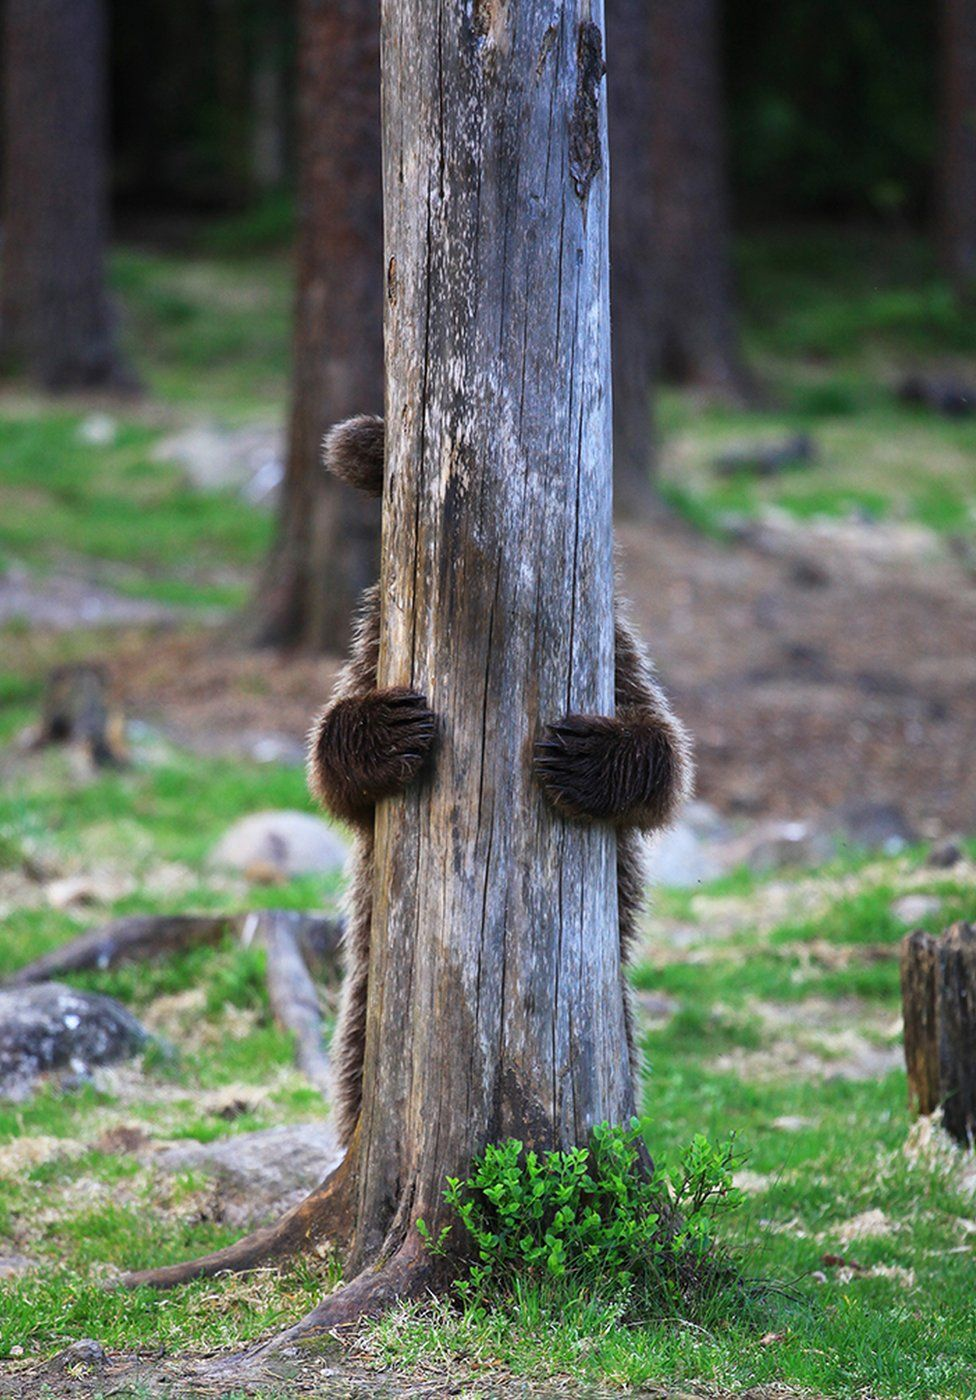 A bear hides behind a tree